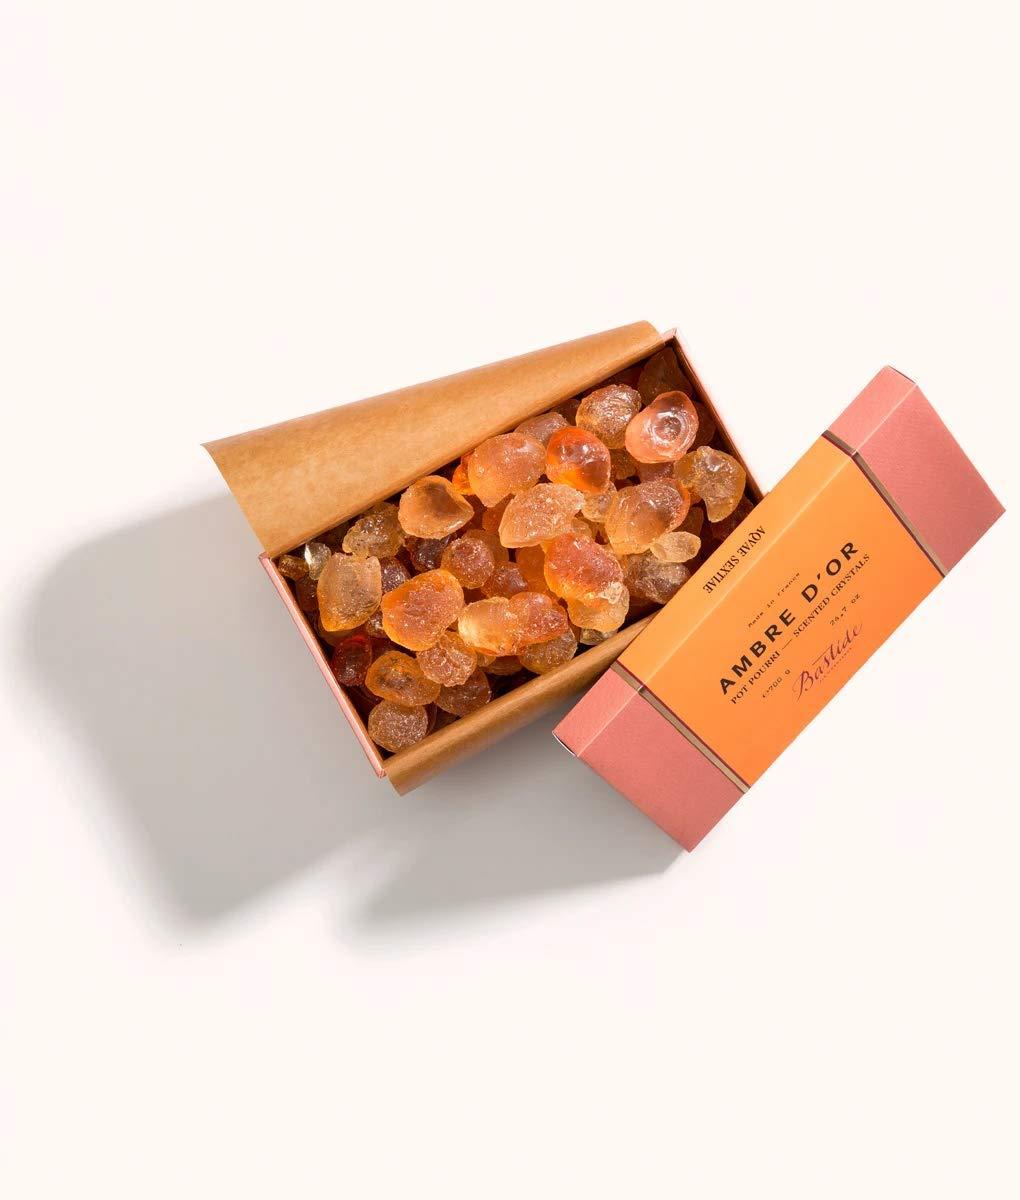 Côté Bastide - Ambre d'Or Potpourri Crystals (24.7oz / 700g) Made in France by Bastide